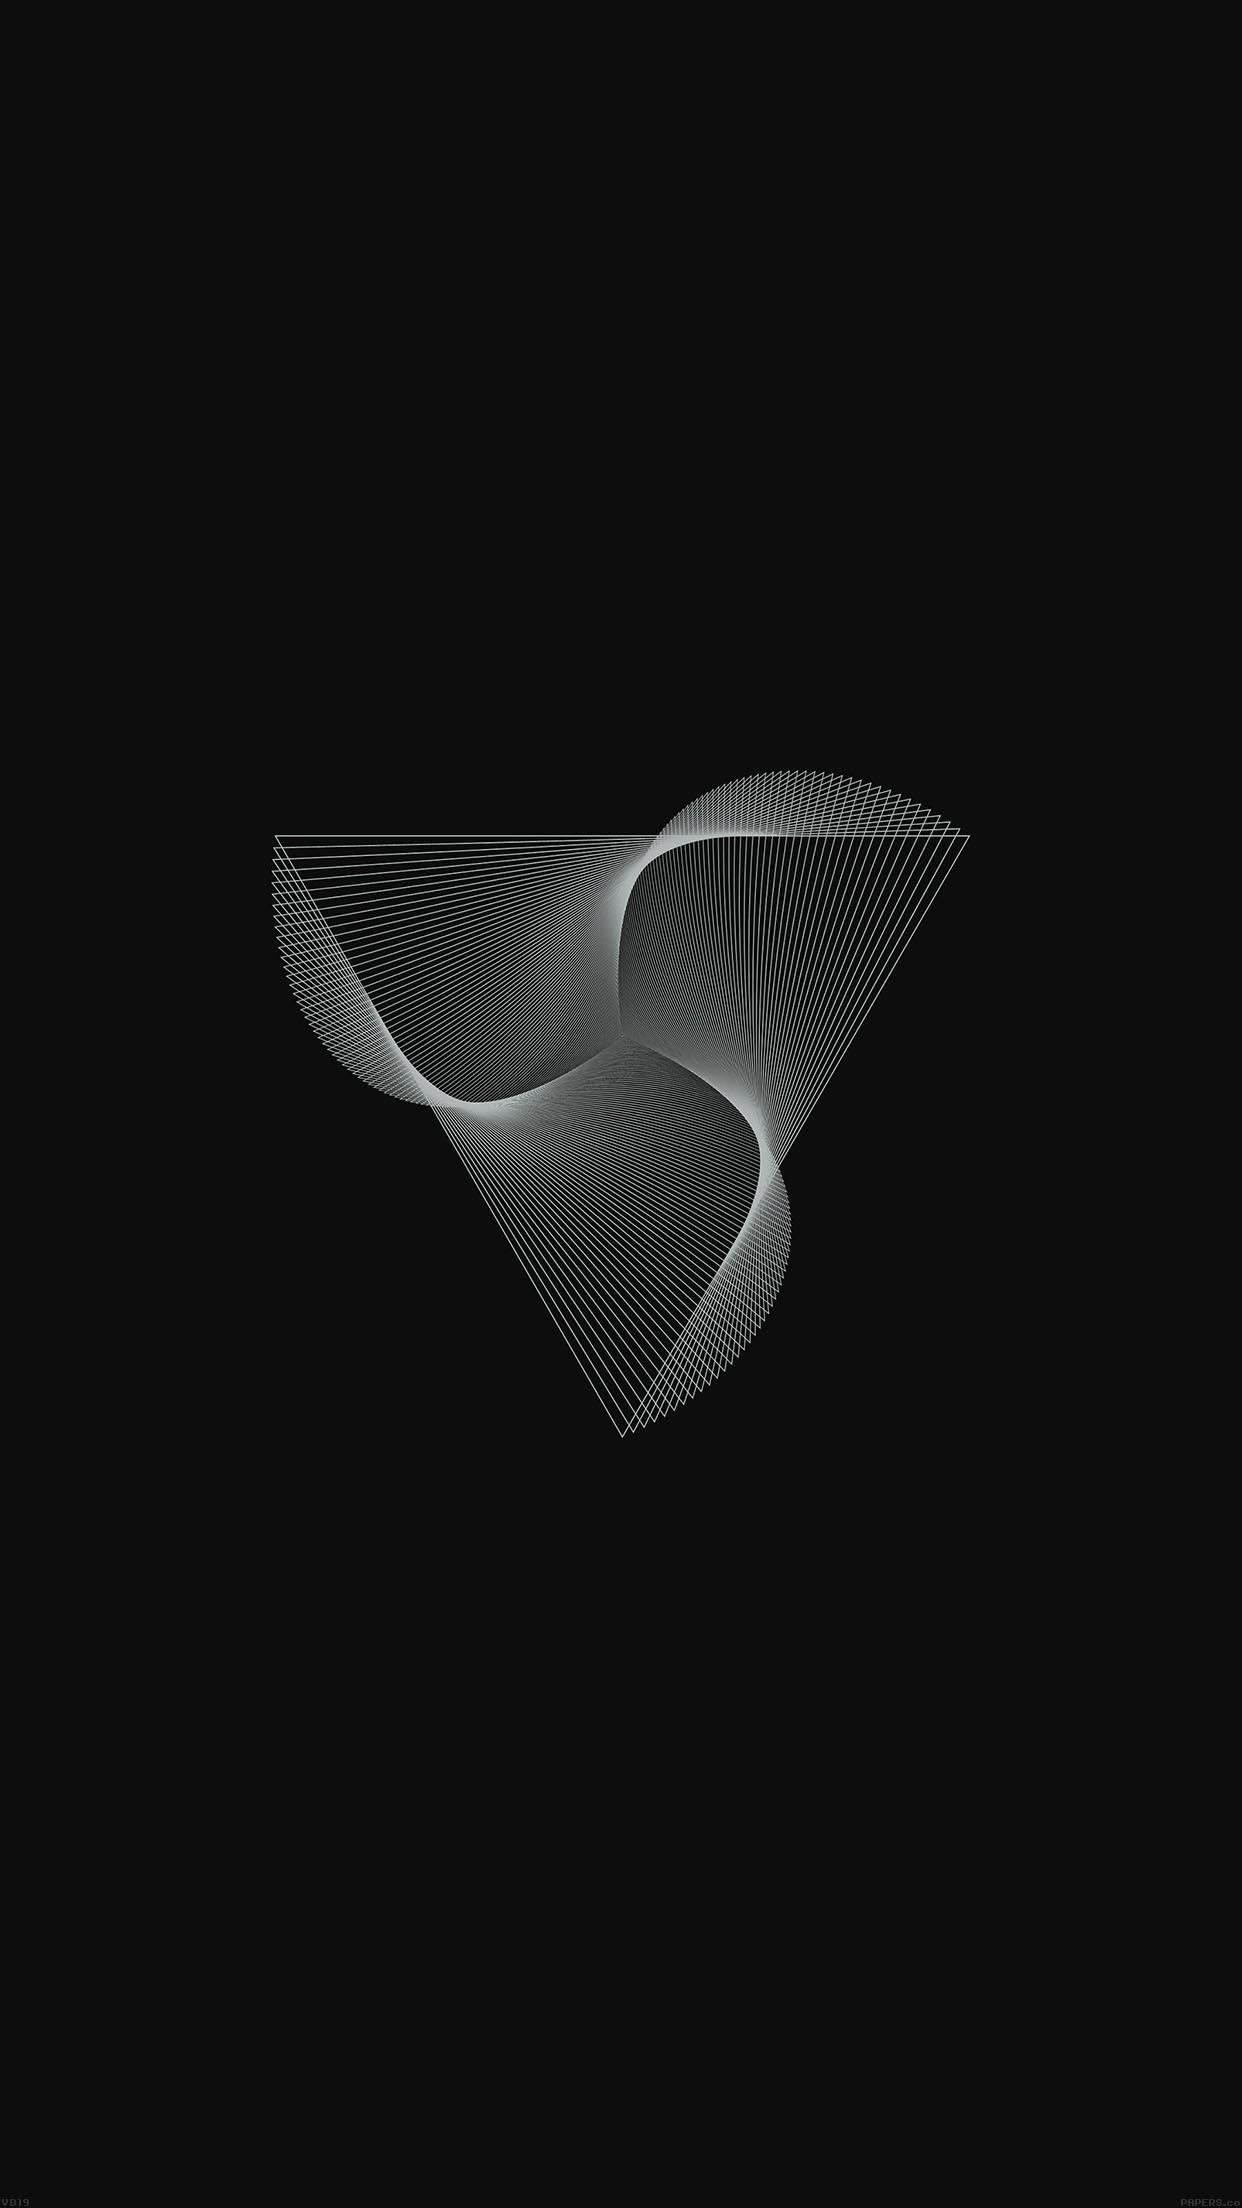 diamond two art iPhone 6 Plus Wallpapers – illust studio iPhone 6 Plus  Wallpapers